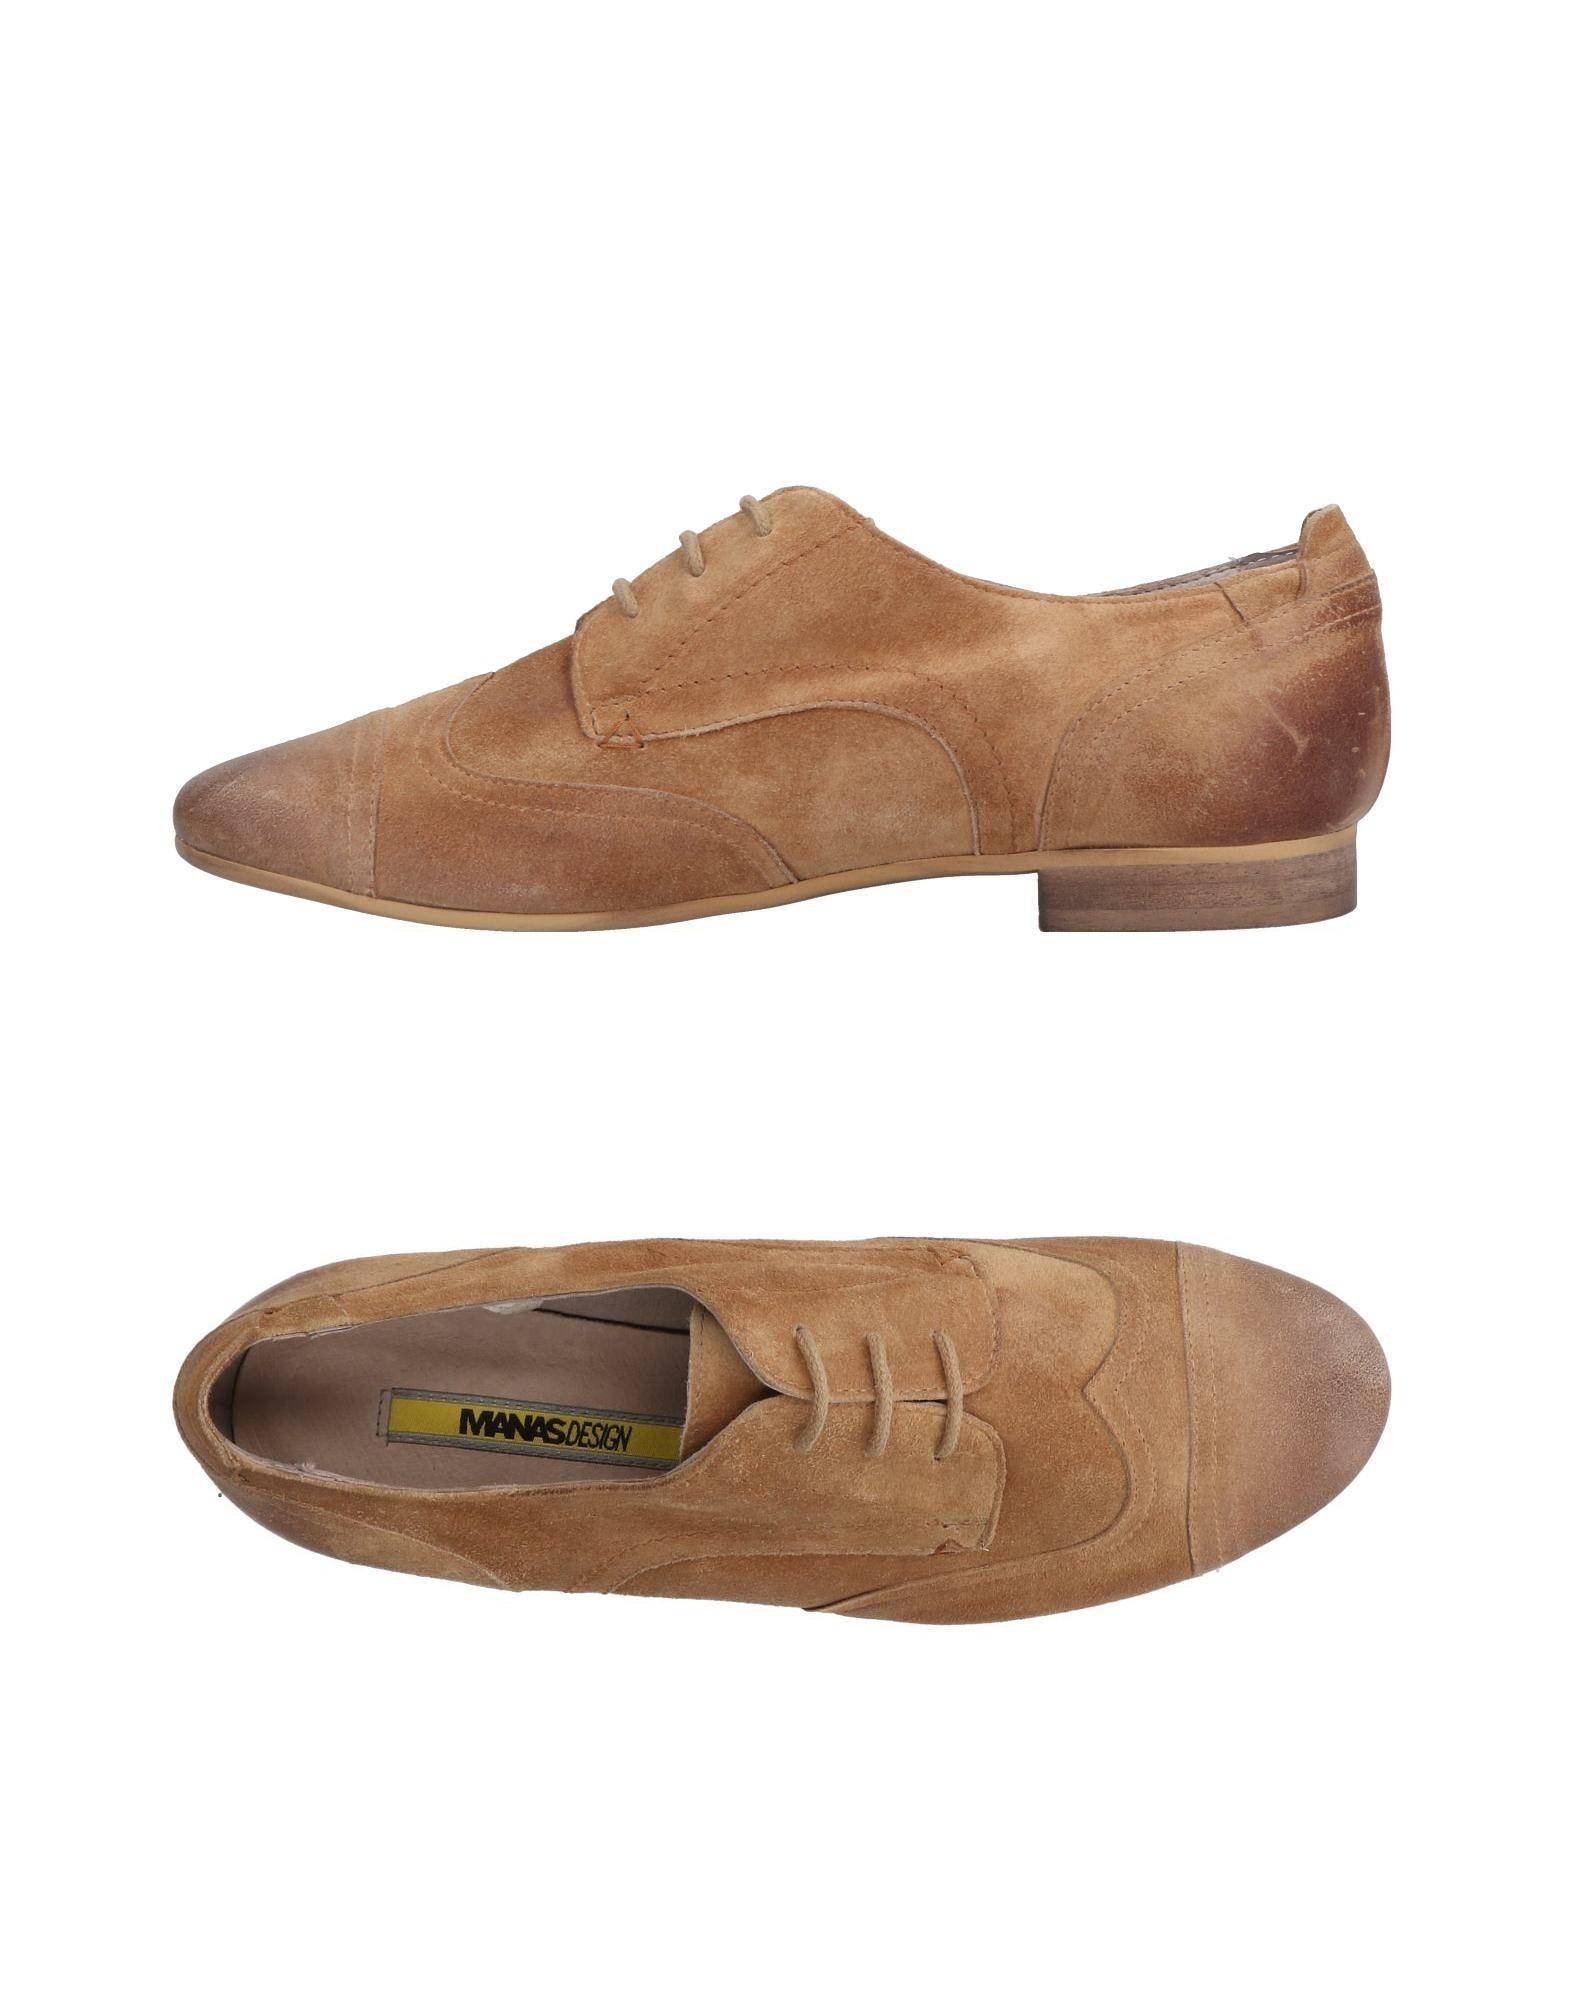 Manas Lea Foscati Schnürschuhe Damen  11497419UJ Gute Qualität beliebte Schuhe